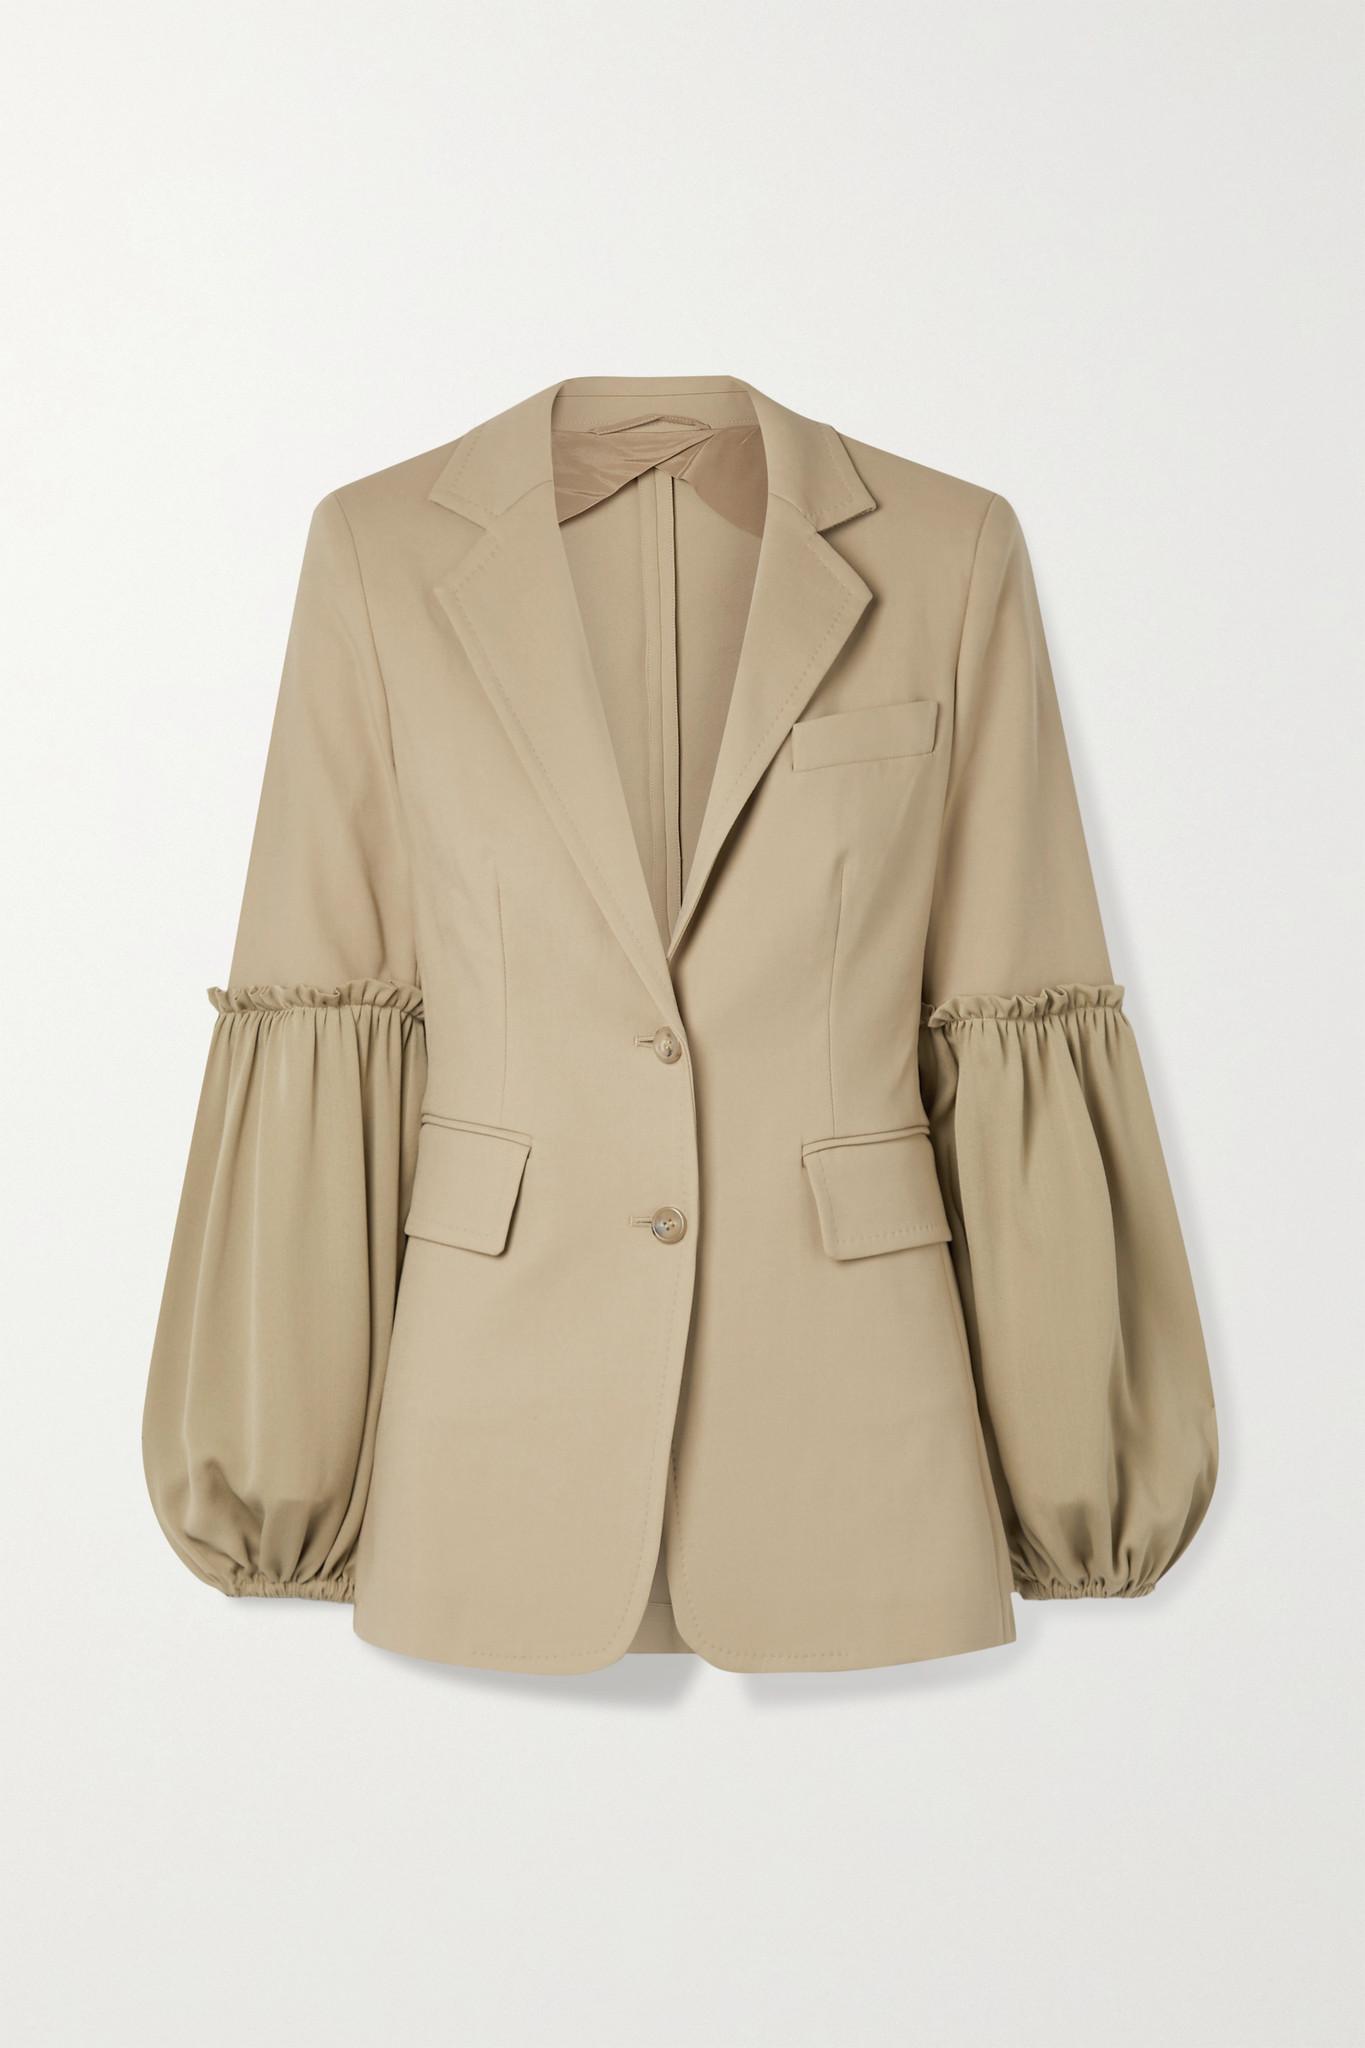 MAX MARA - Pasta Stretch-cotton And Silk Crepe De Chine Blazer - Neutrals - UK8